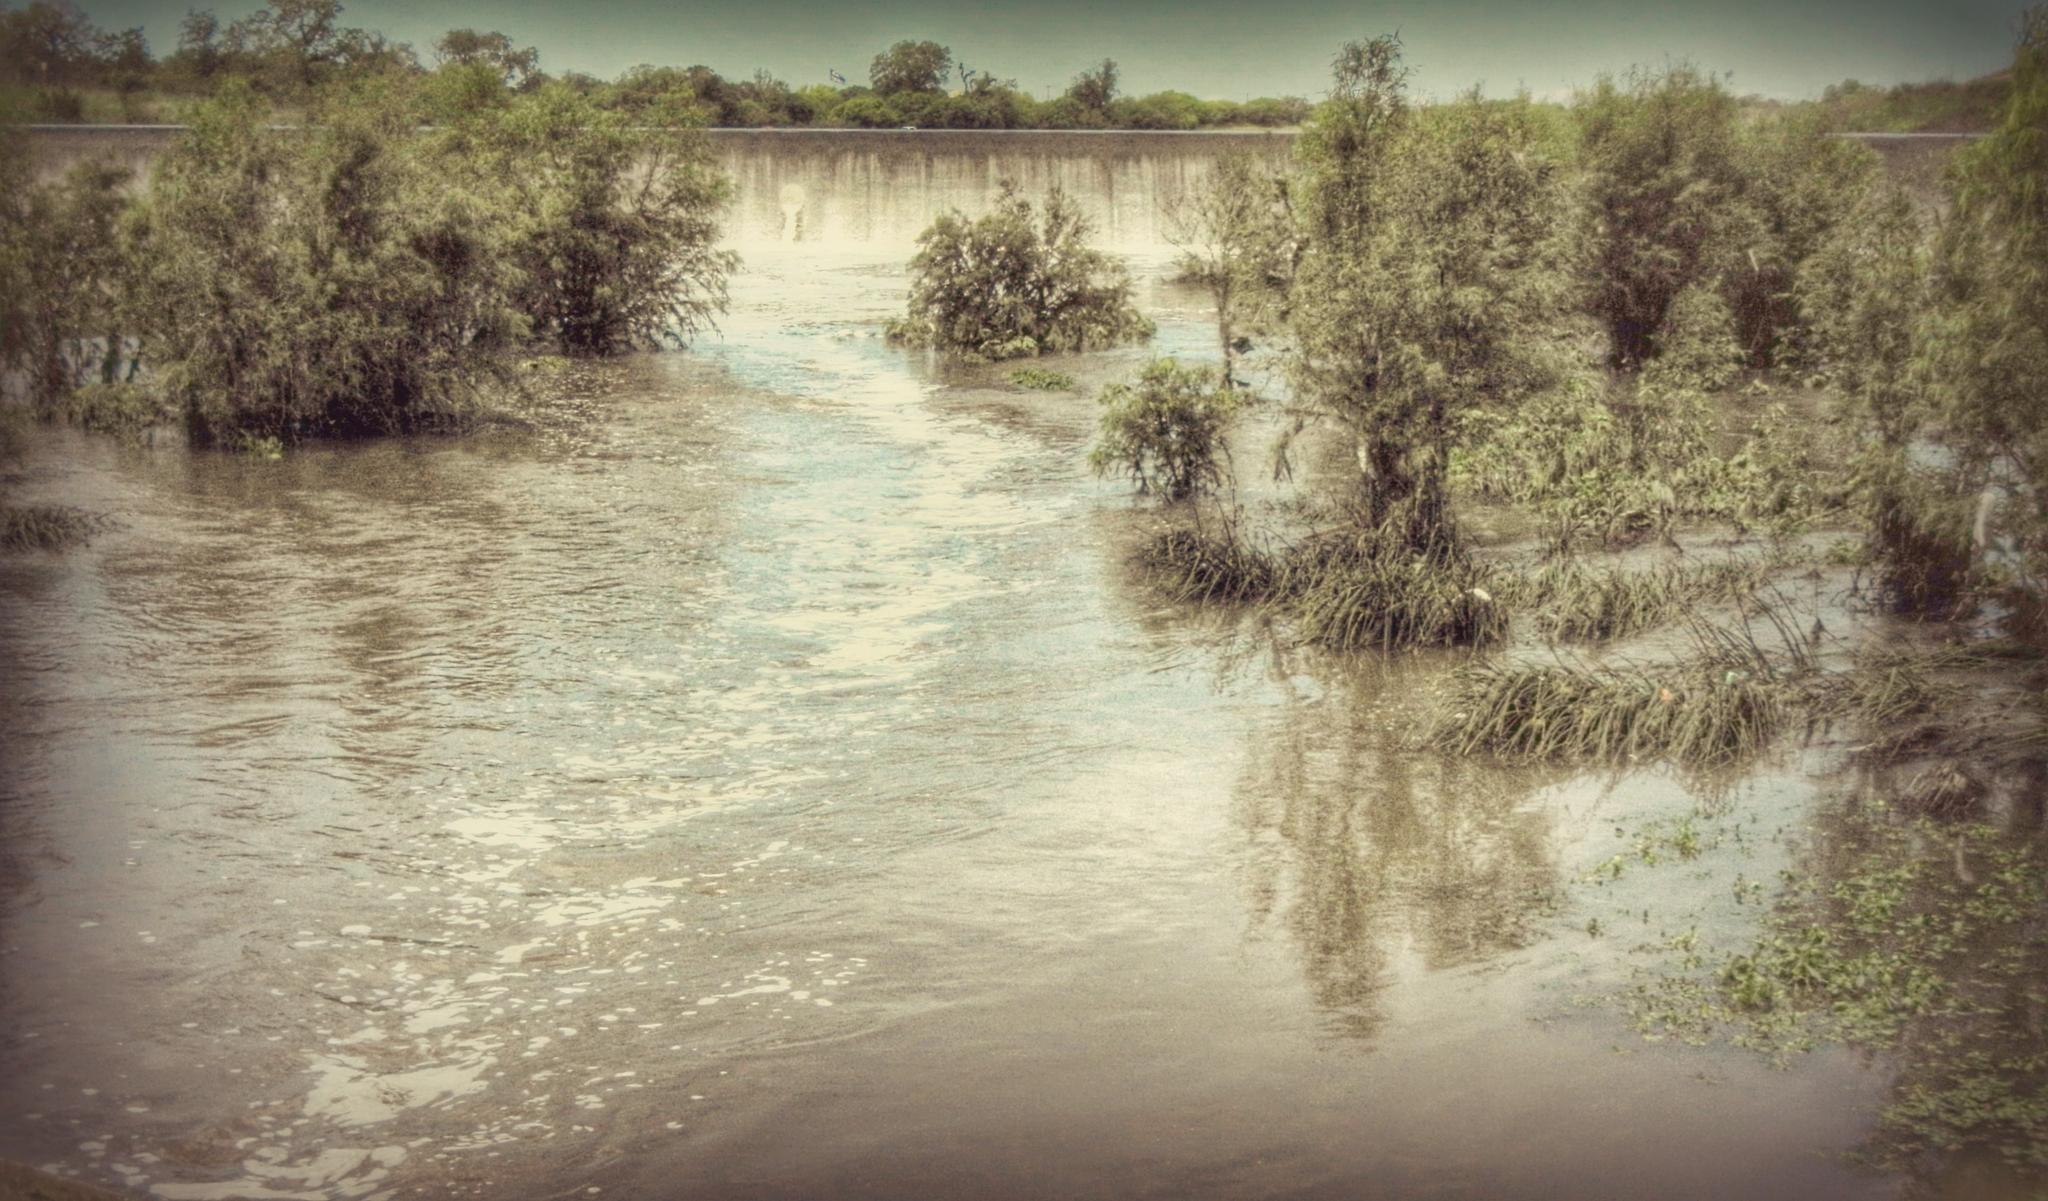 Texas Flood by 3dotstudio